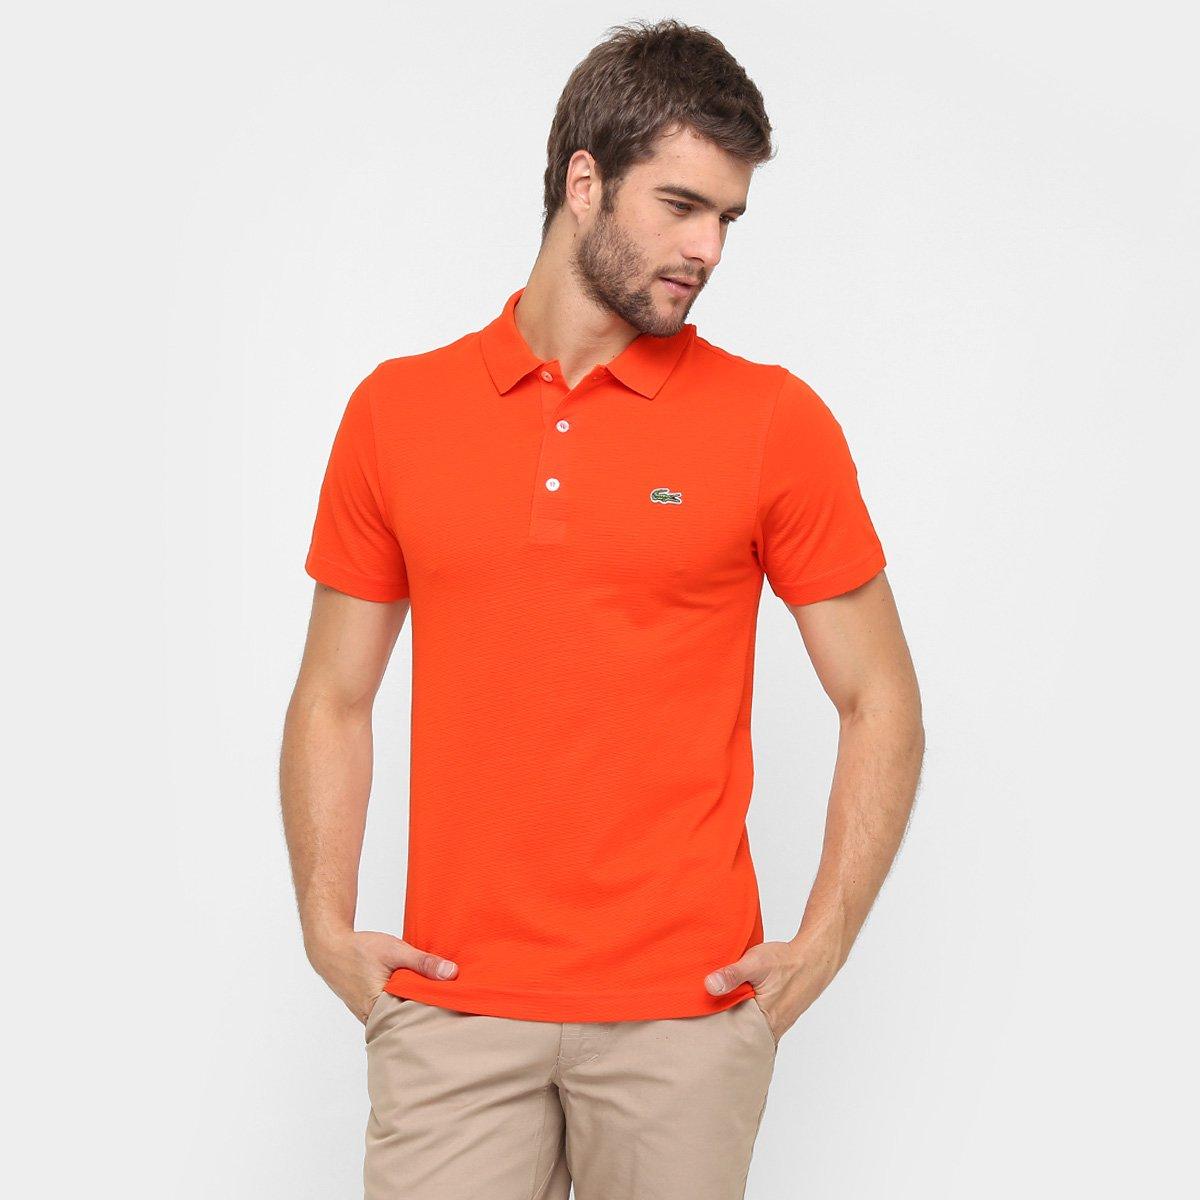 Camisa Polo Lacoste Super Light Masculina - Laranja e Verde - Compre ... 738a26a3d65f4